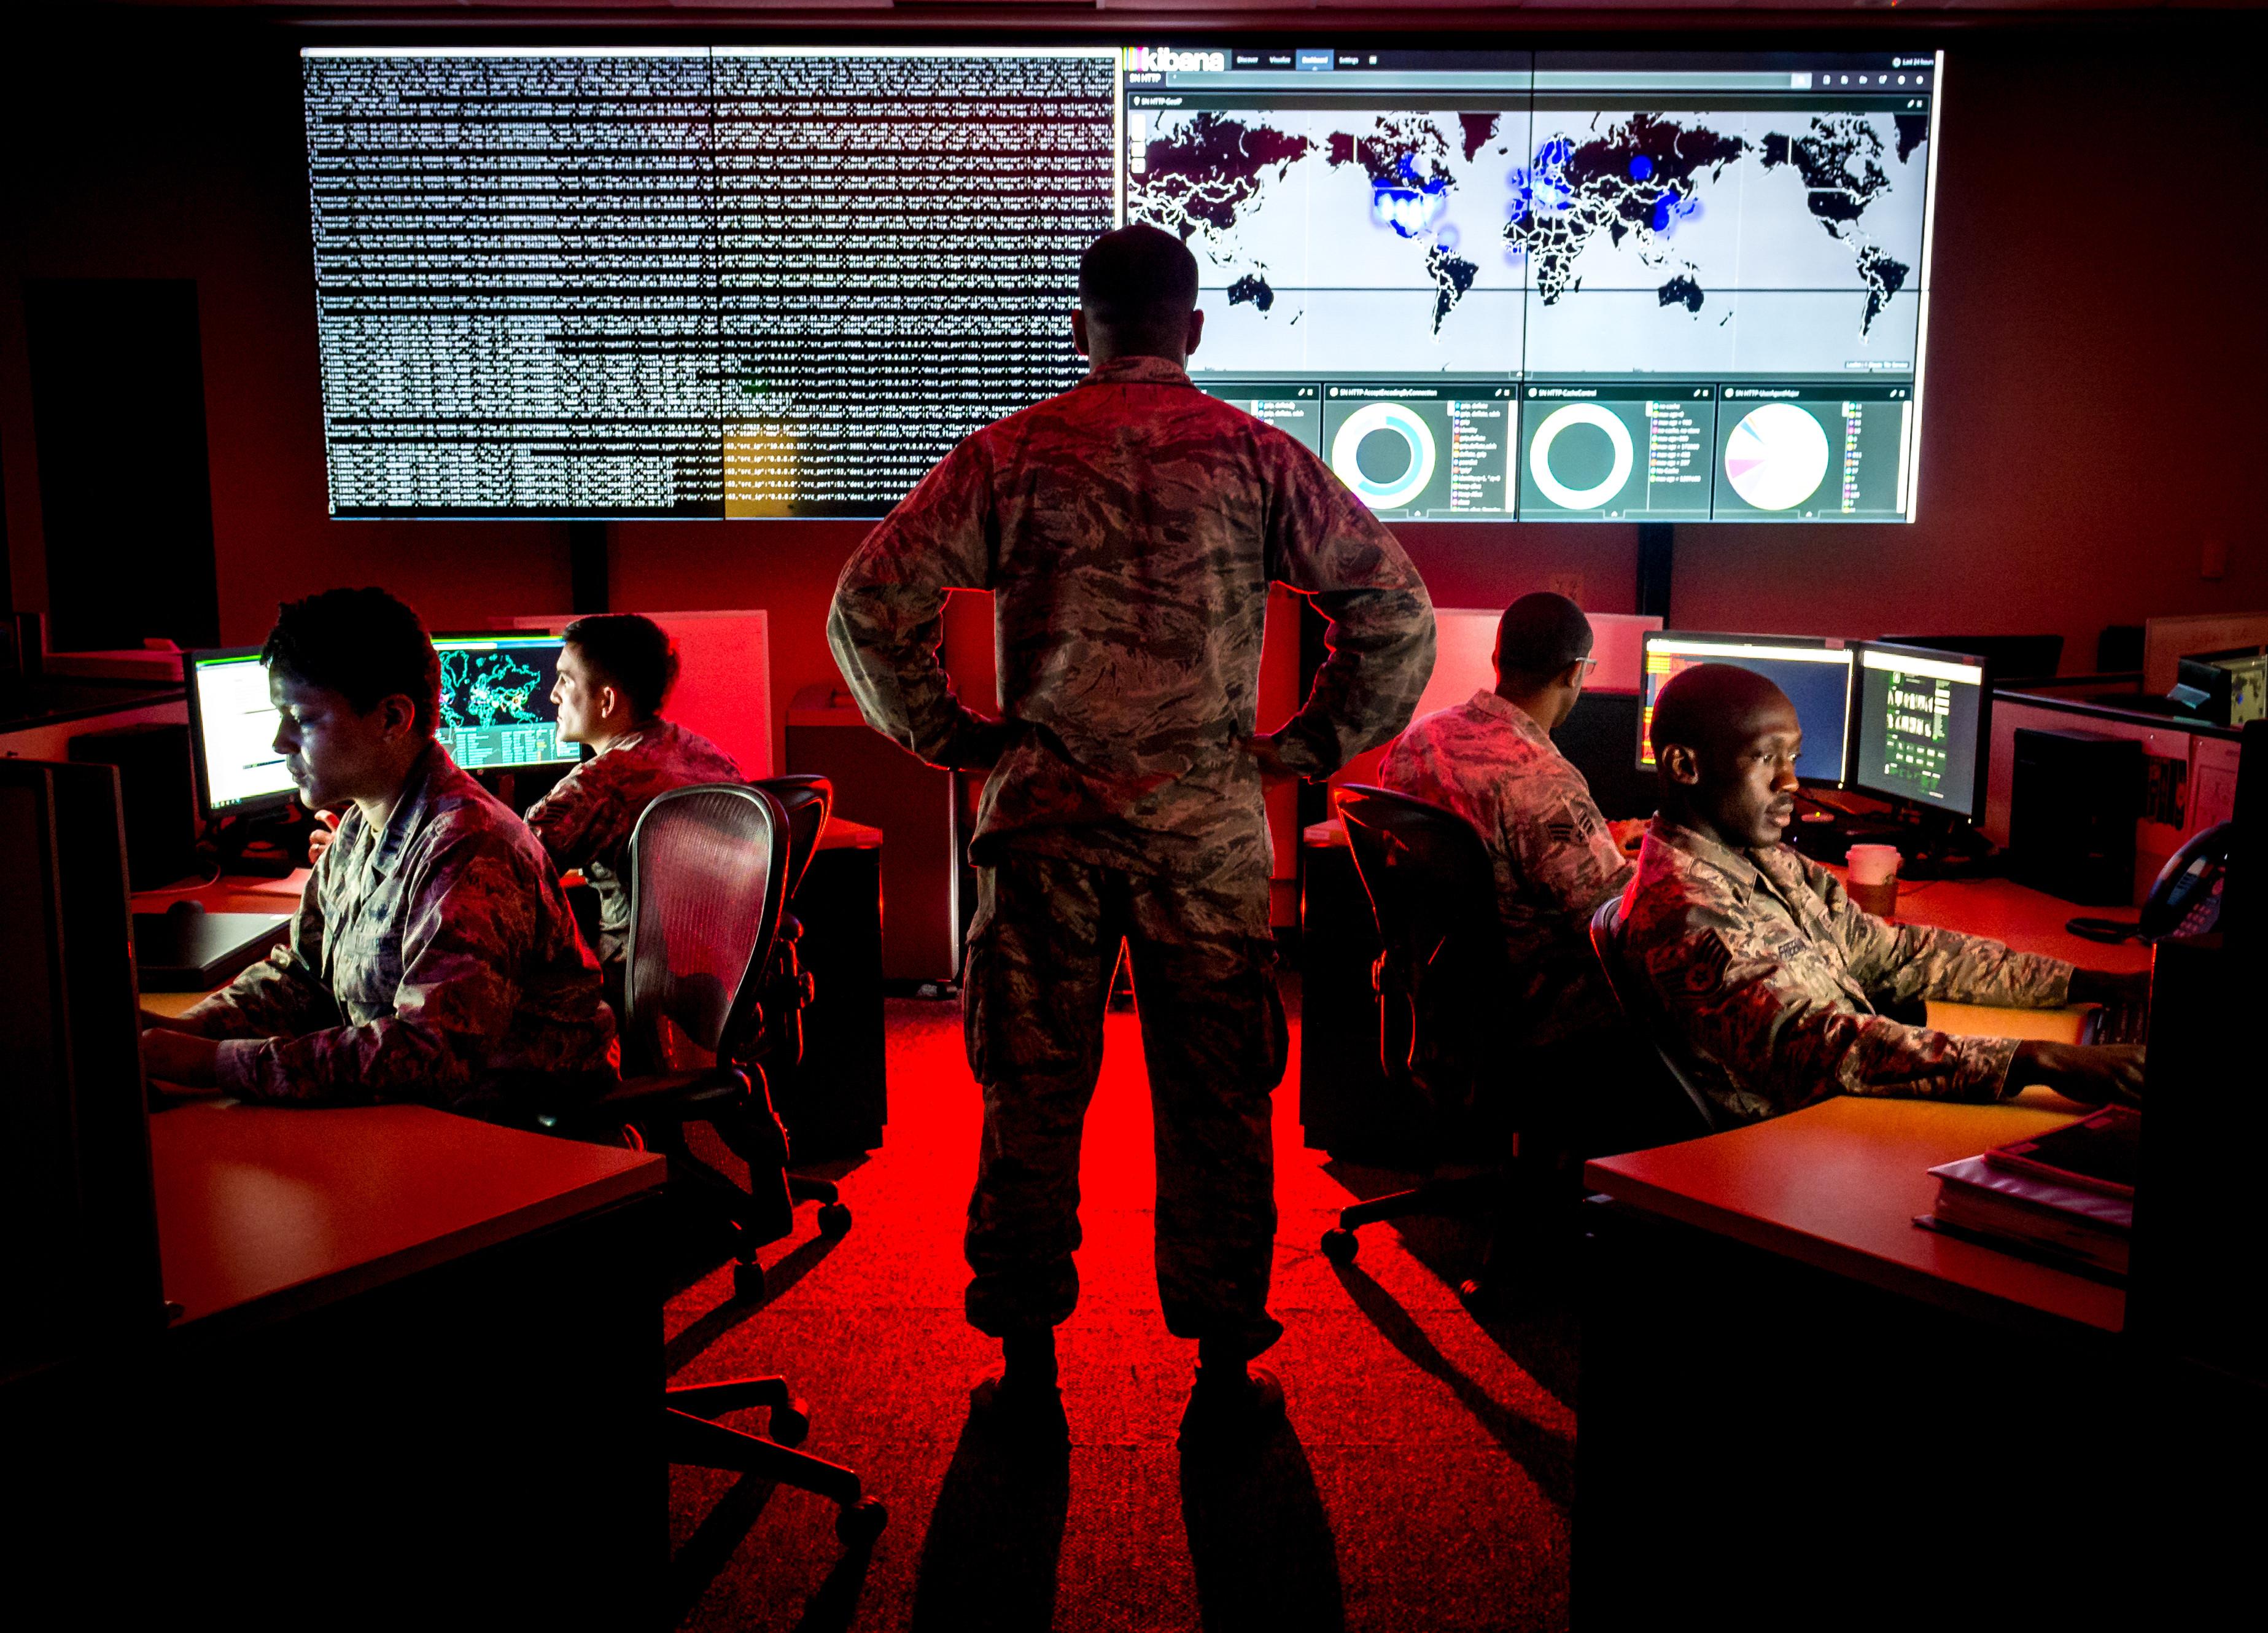 Разведка США обвинила Россию в кибератаке на SolarWinds